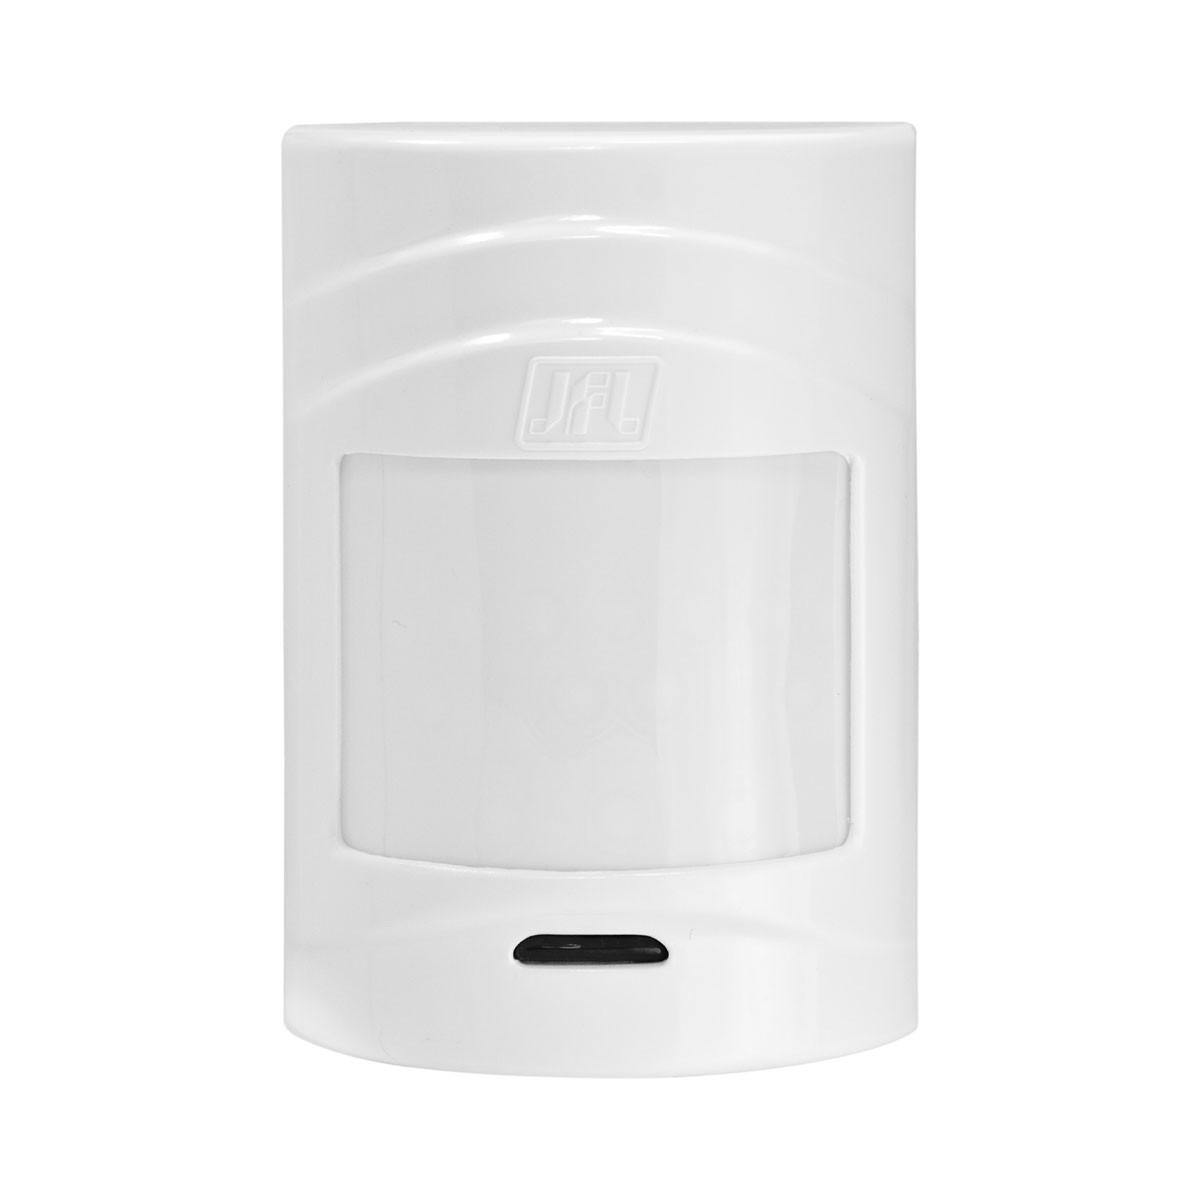 Kit Alarme Jfl Active 20 Ethernet 6 Sensores Sem Fio IrPet 530sf